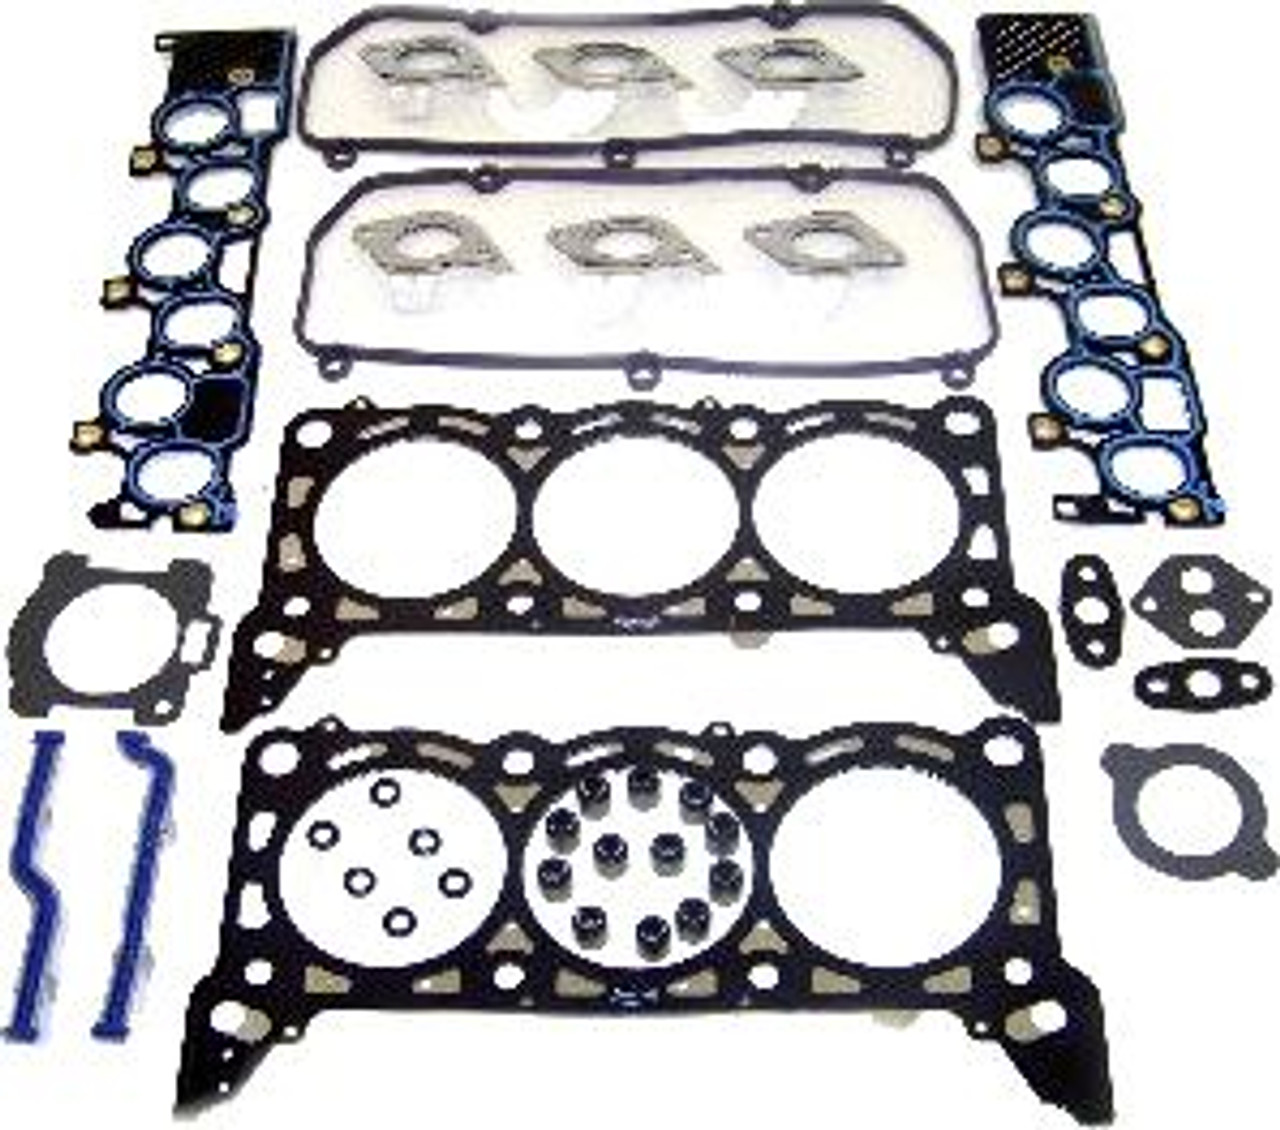 Ford F 150 2000 Cylinder Head Gasket: 1997 Ford F-150 4.2L Engine Cylinder Head Gasket Set